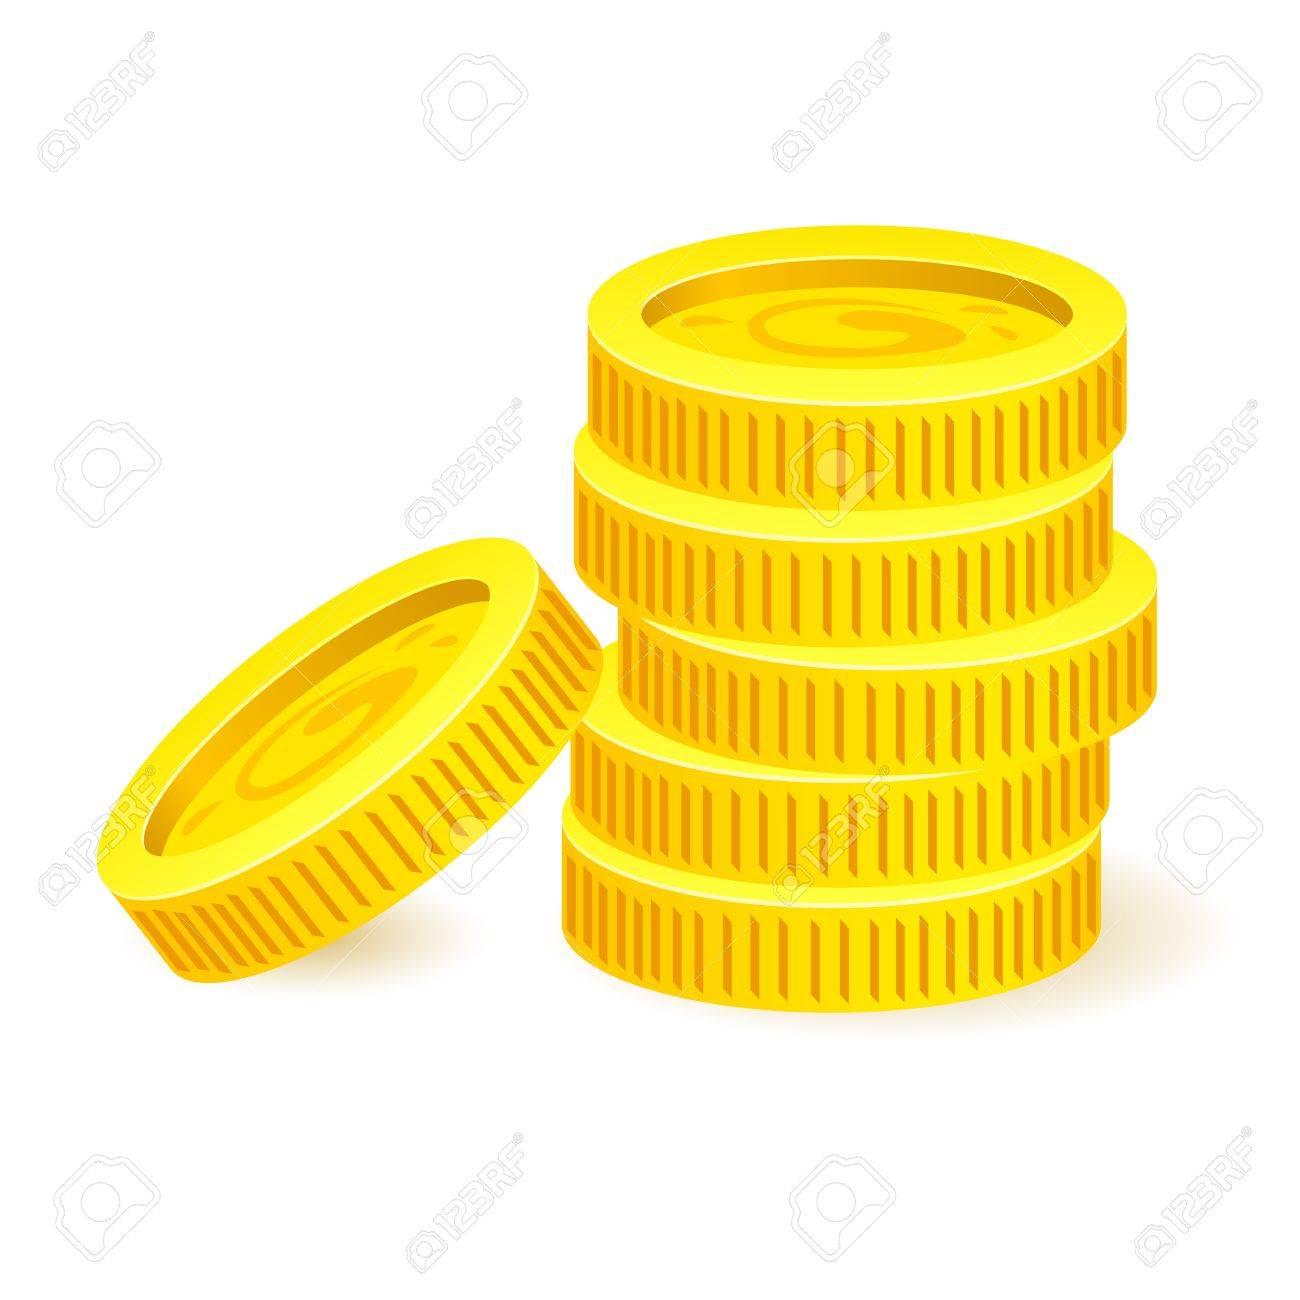 Gold coins. Illustration on white background for design Stock Vector - 18865131